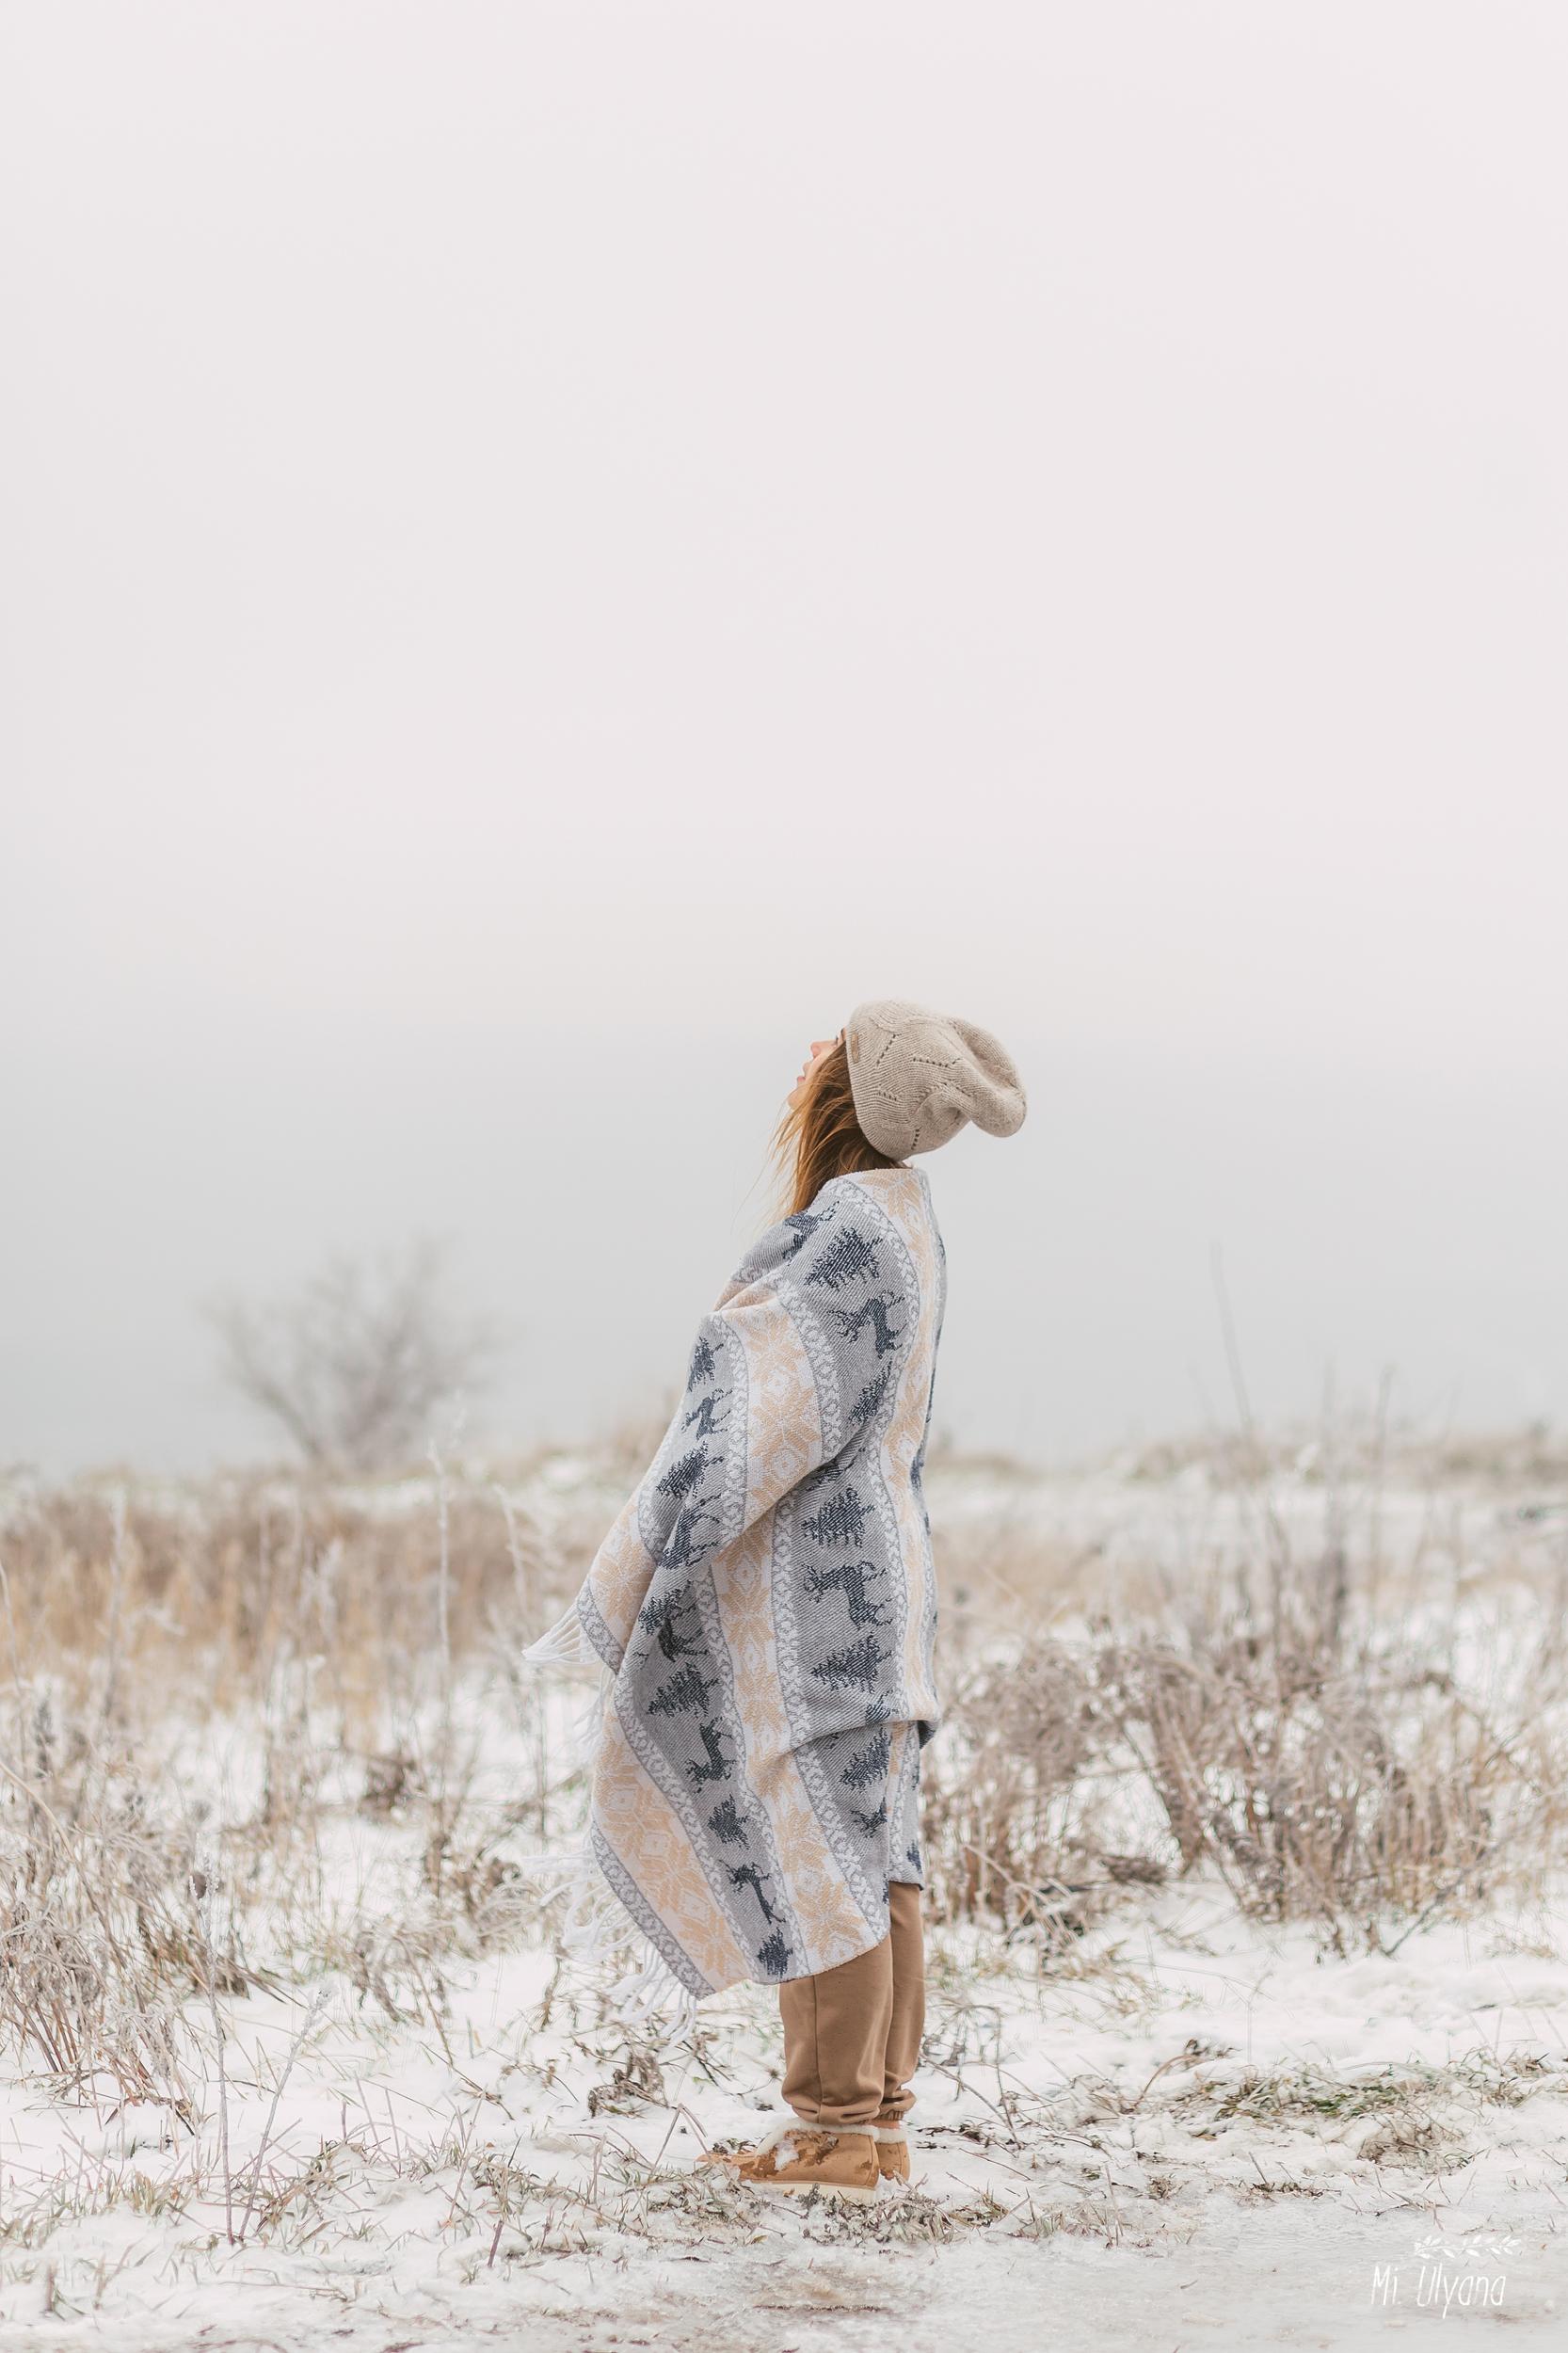 Даша / фотограф Ульяна Буканова (Мизинова)